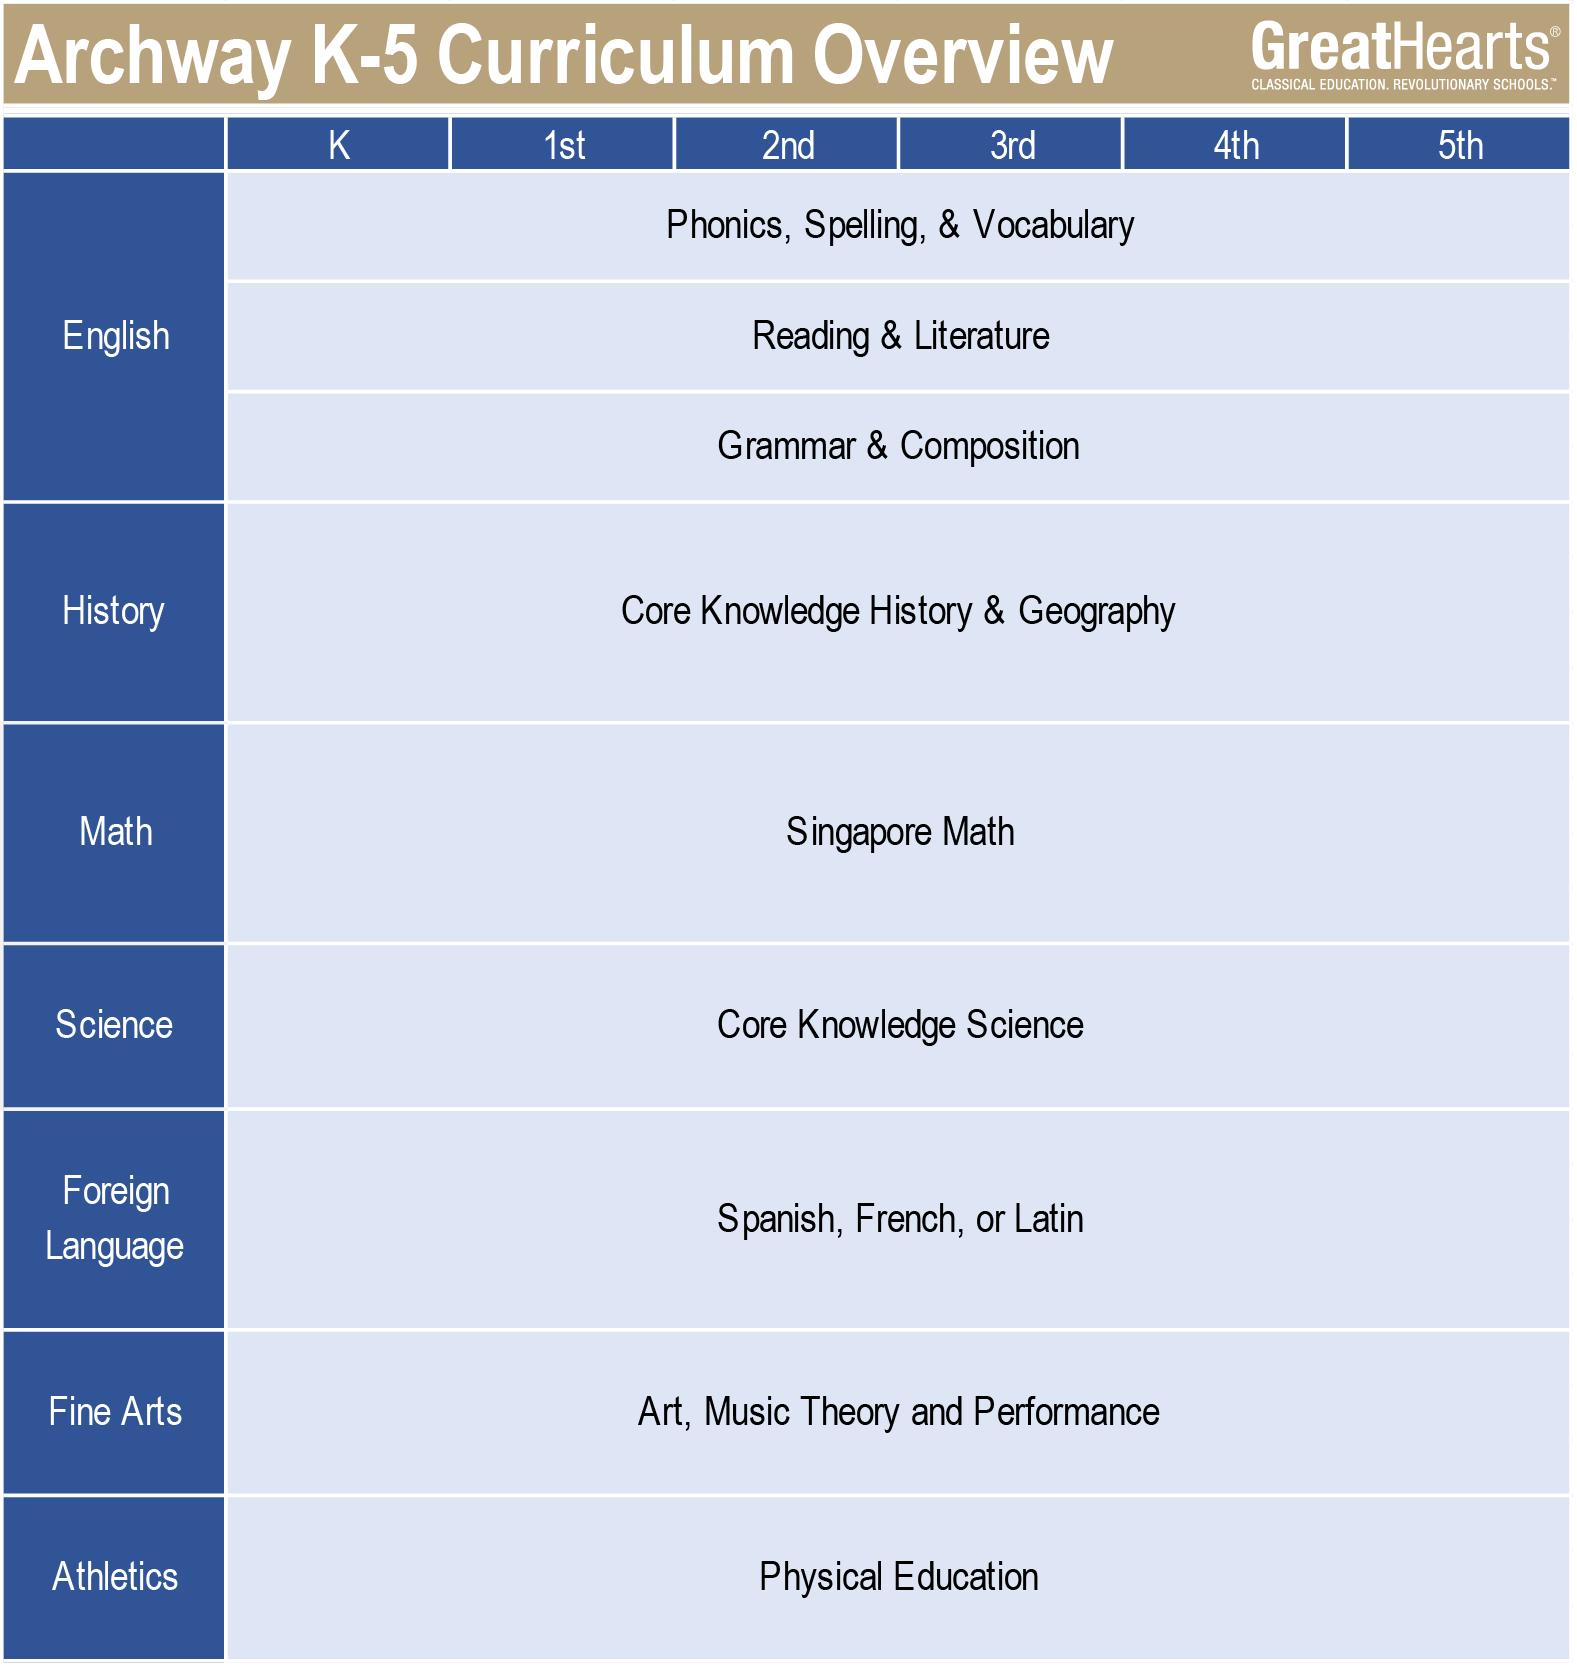 Archway K-5 curriculum